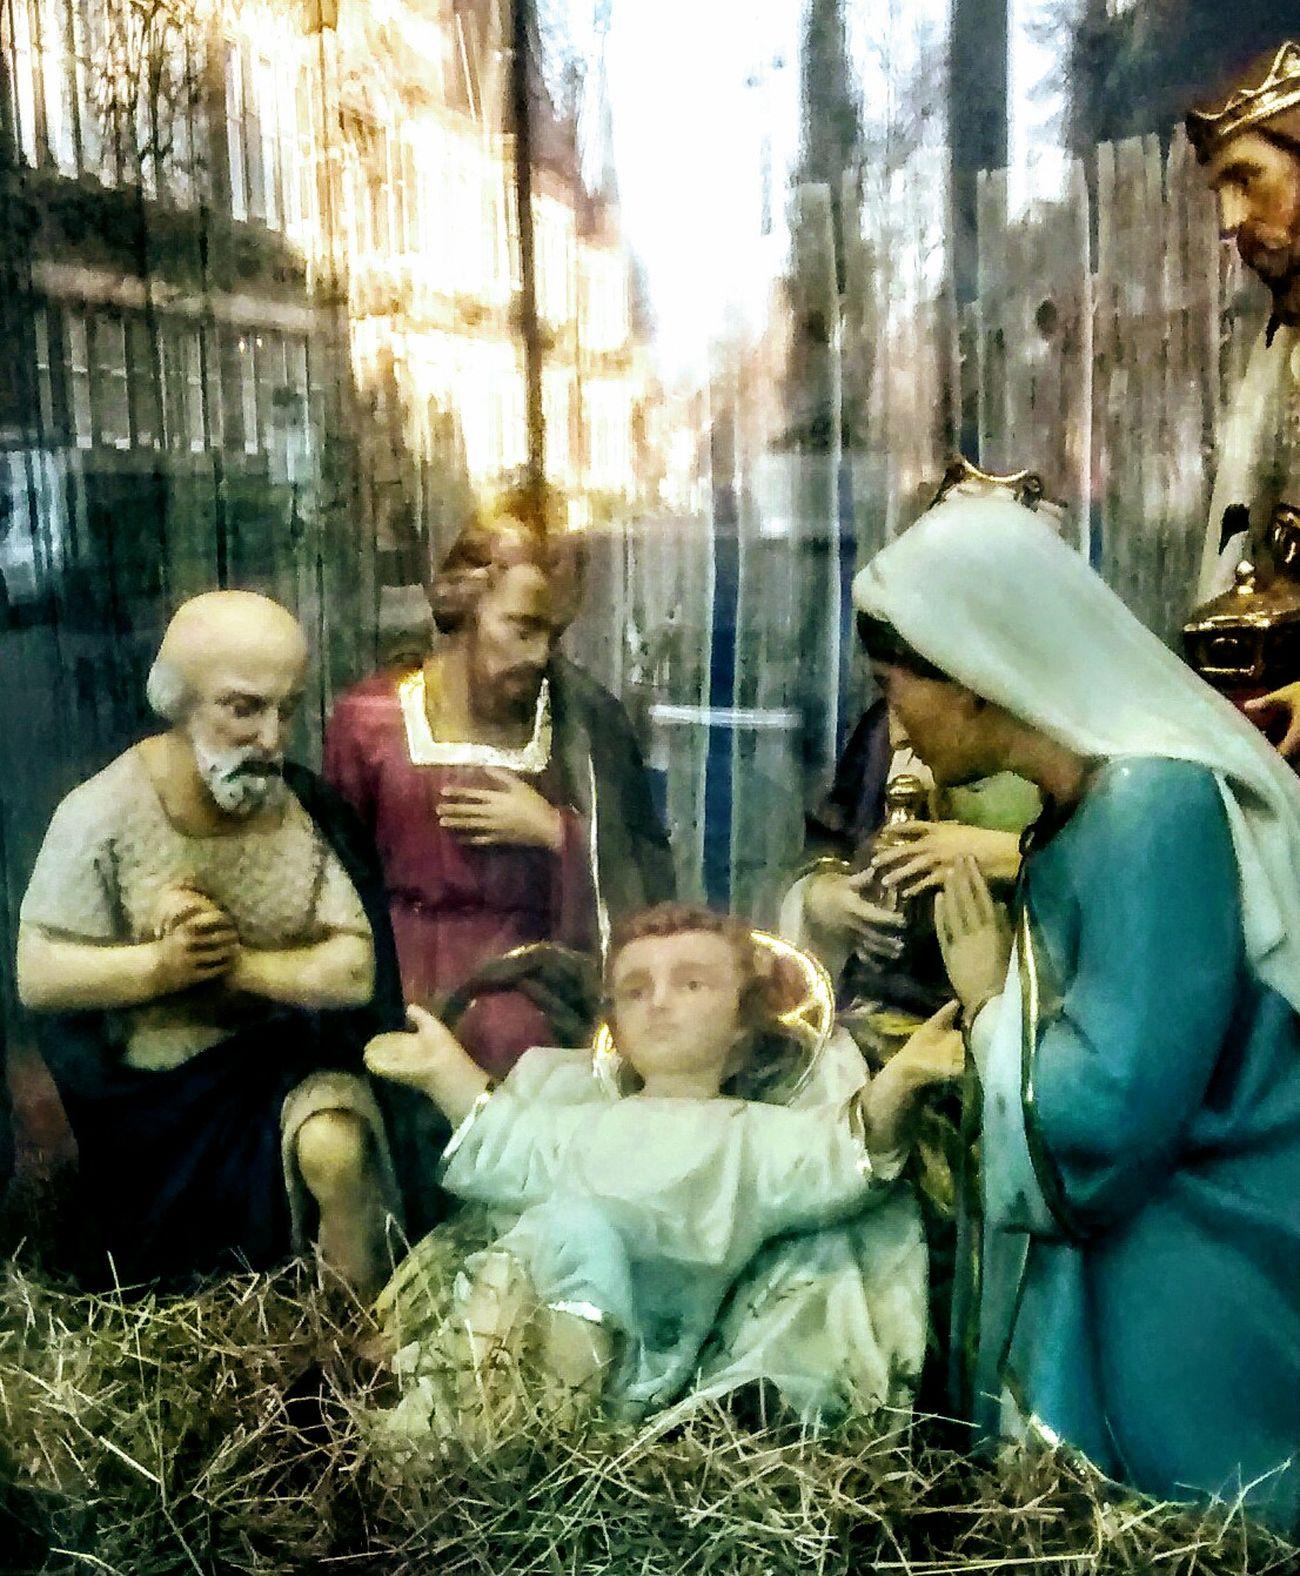 Nativity nativity scene